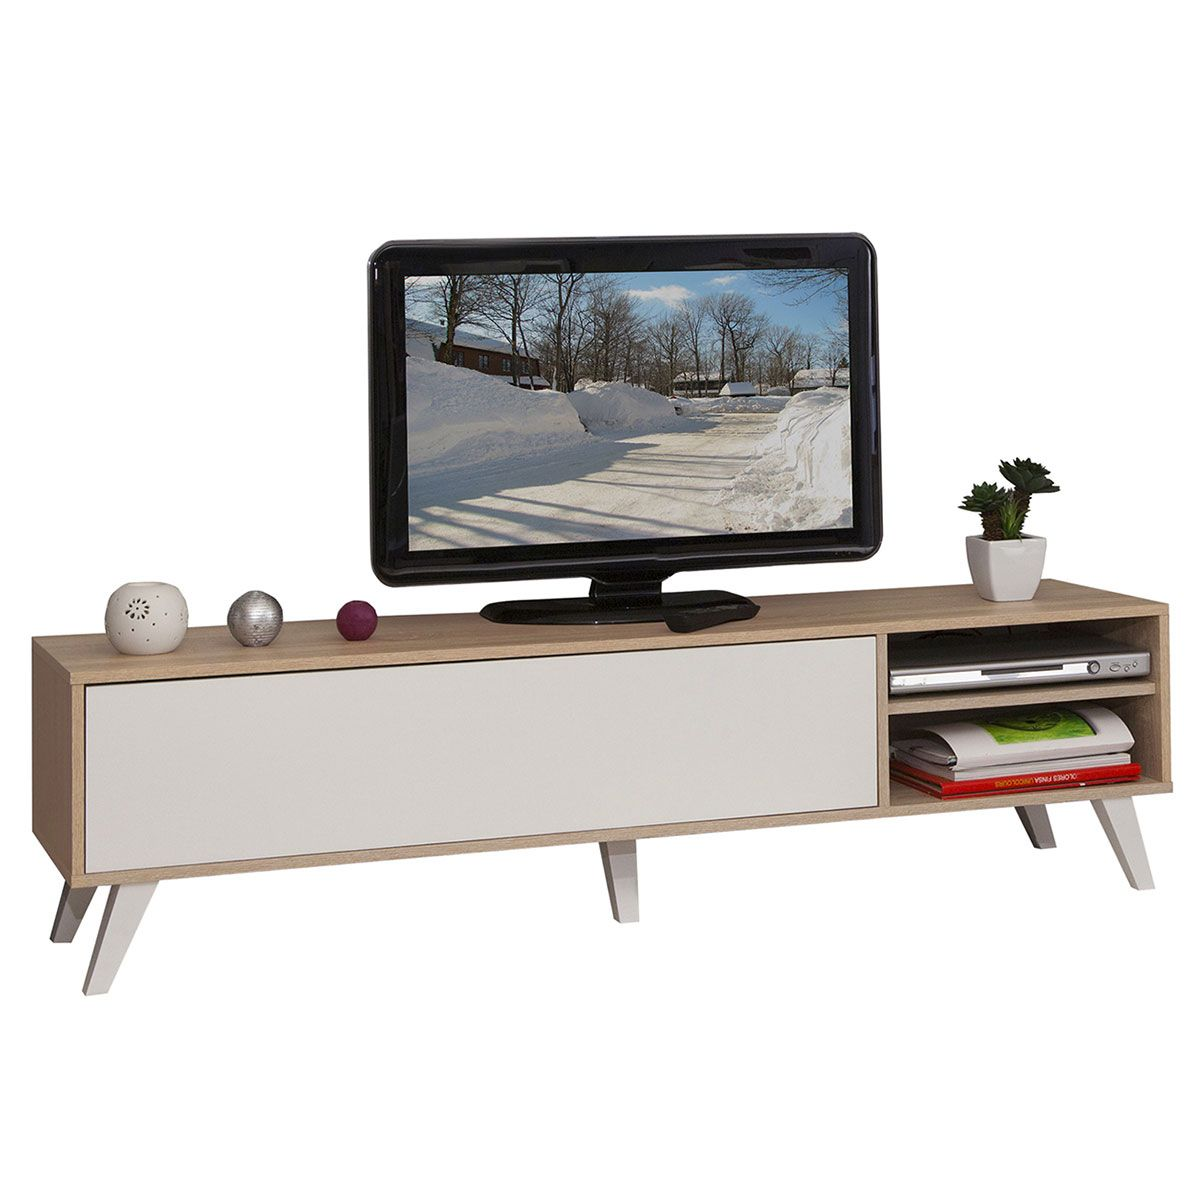 G N Rique Meuble Tv Pieds Inclin S 140 Cm Ch Ne Blanc 3170a3421a01  # Meuble Tv Sur Pied